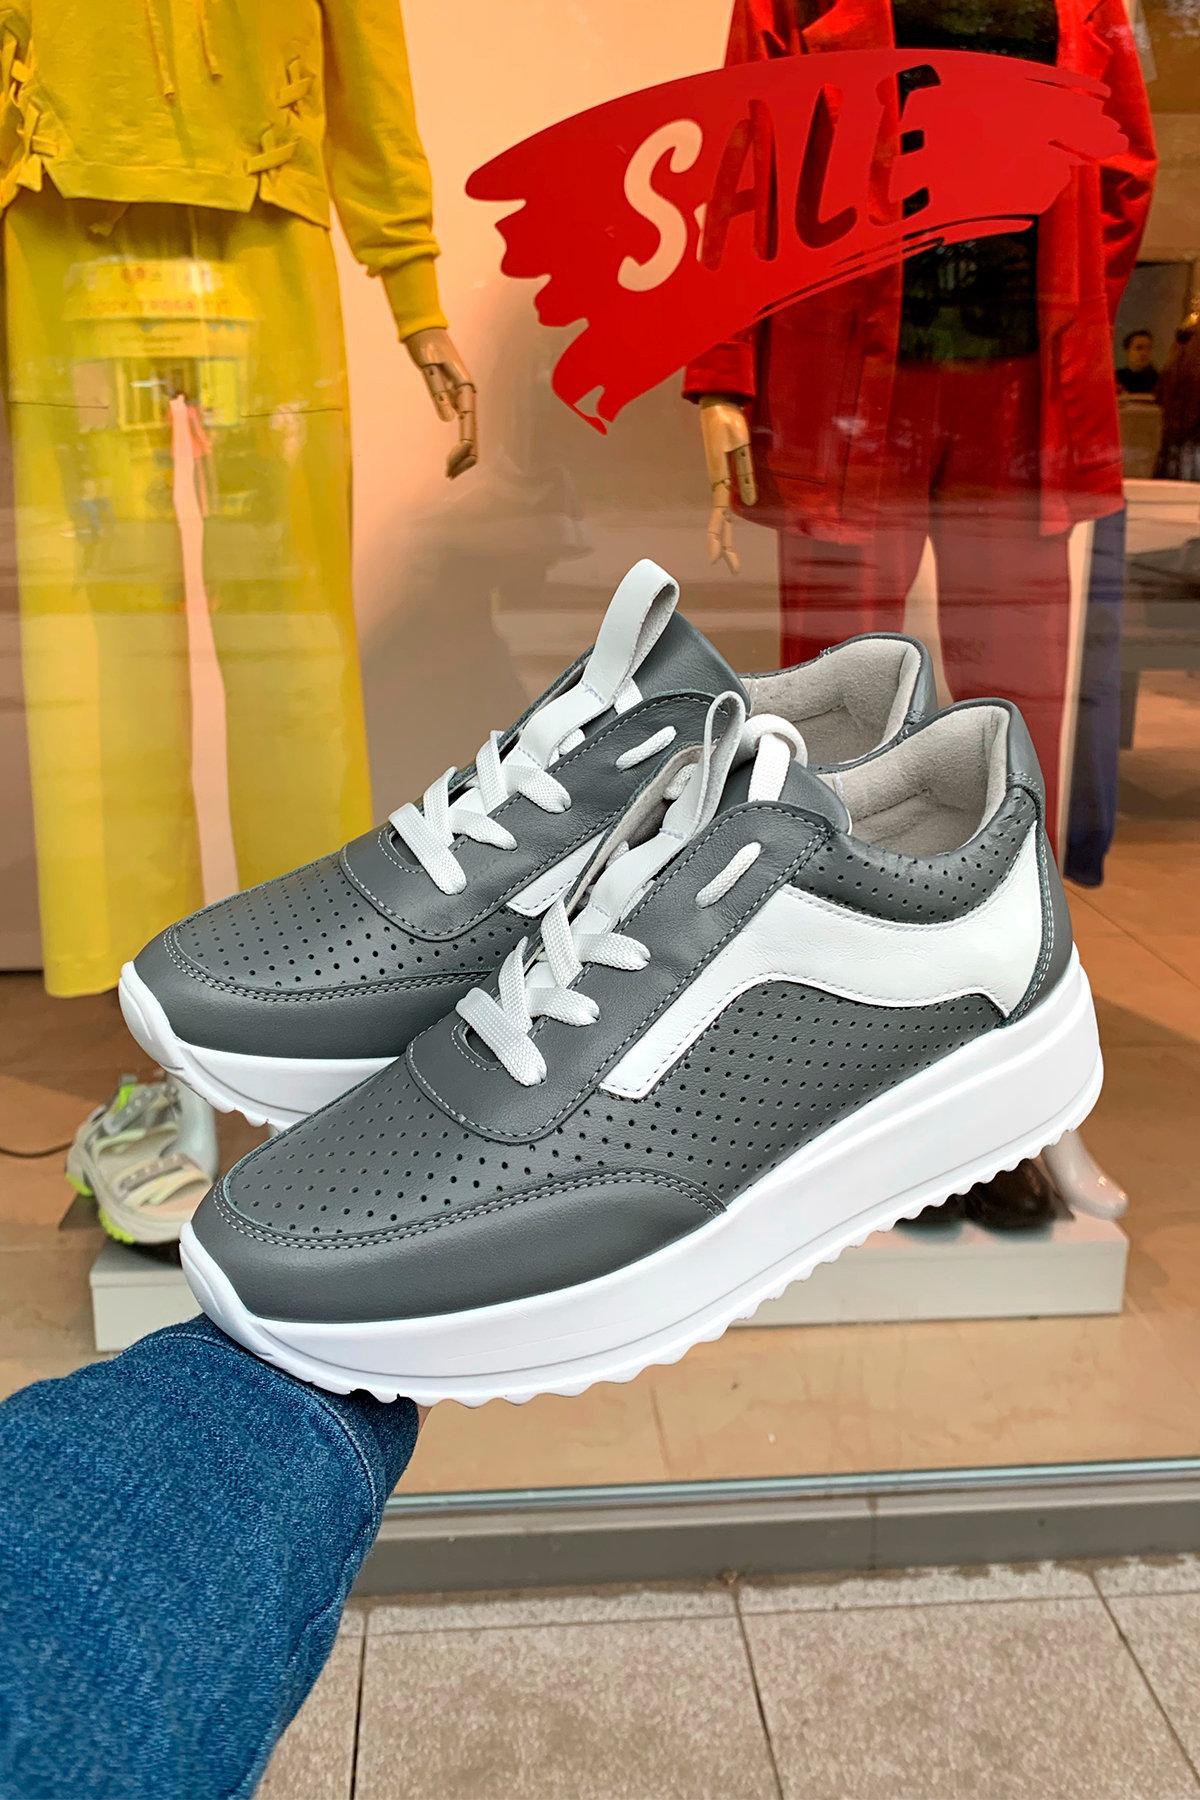 NEW CROSS 505 АРТ. 45618 Цвет: Серый/белый - фото 2, интернет магазин tm-modus.ru